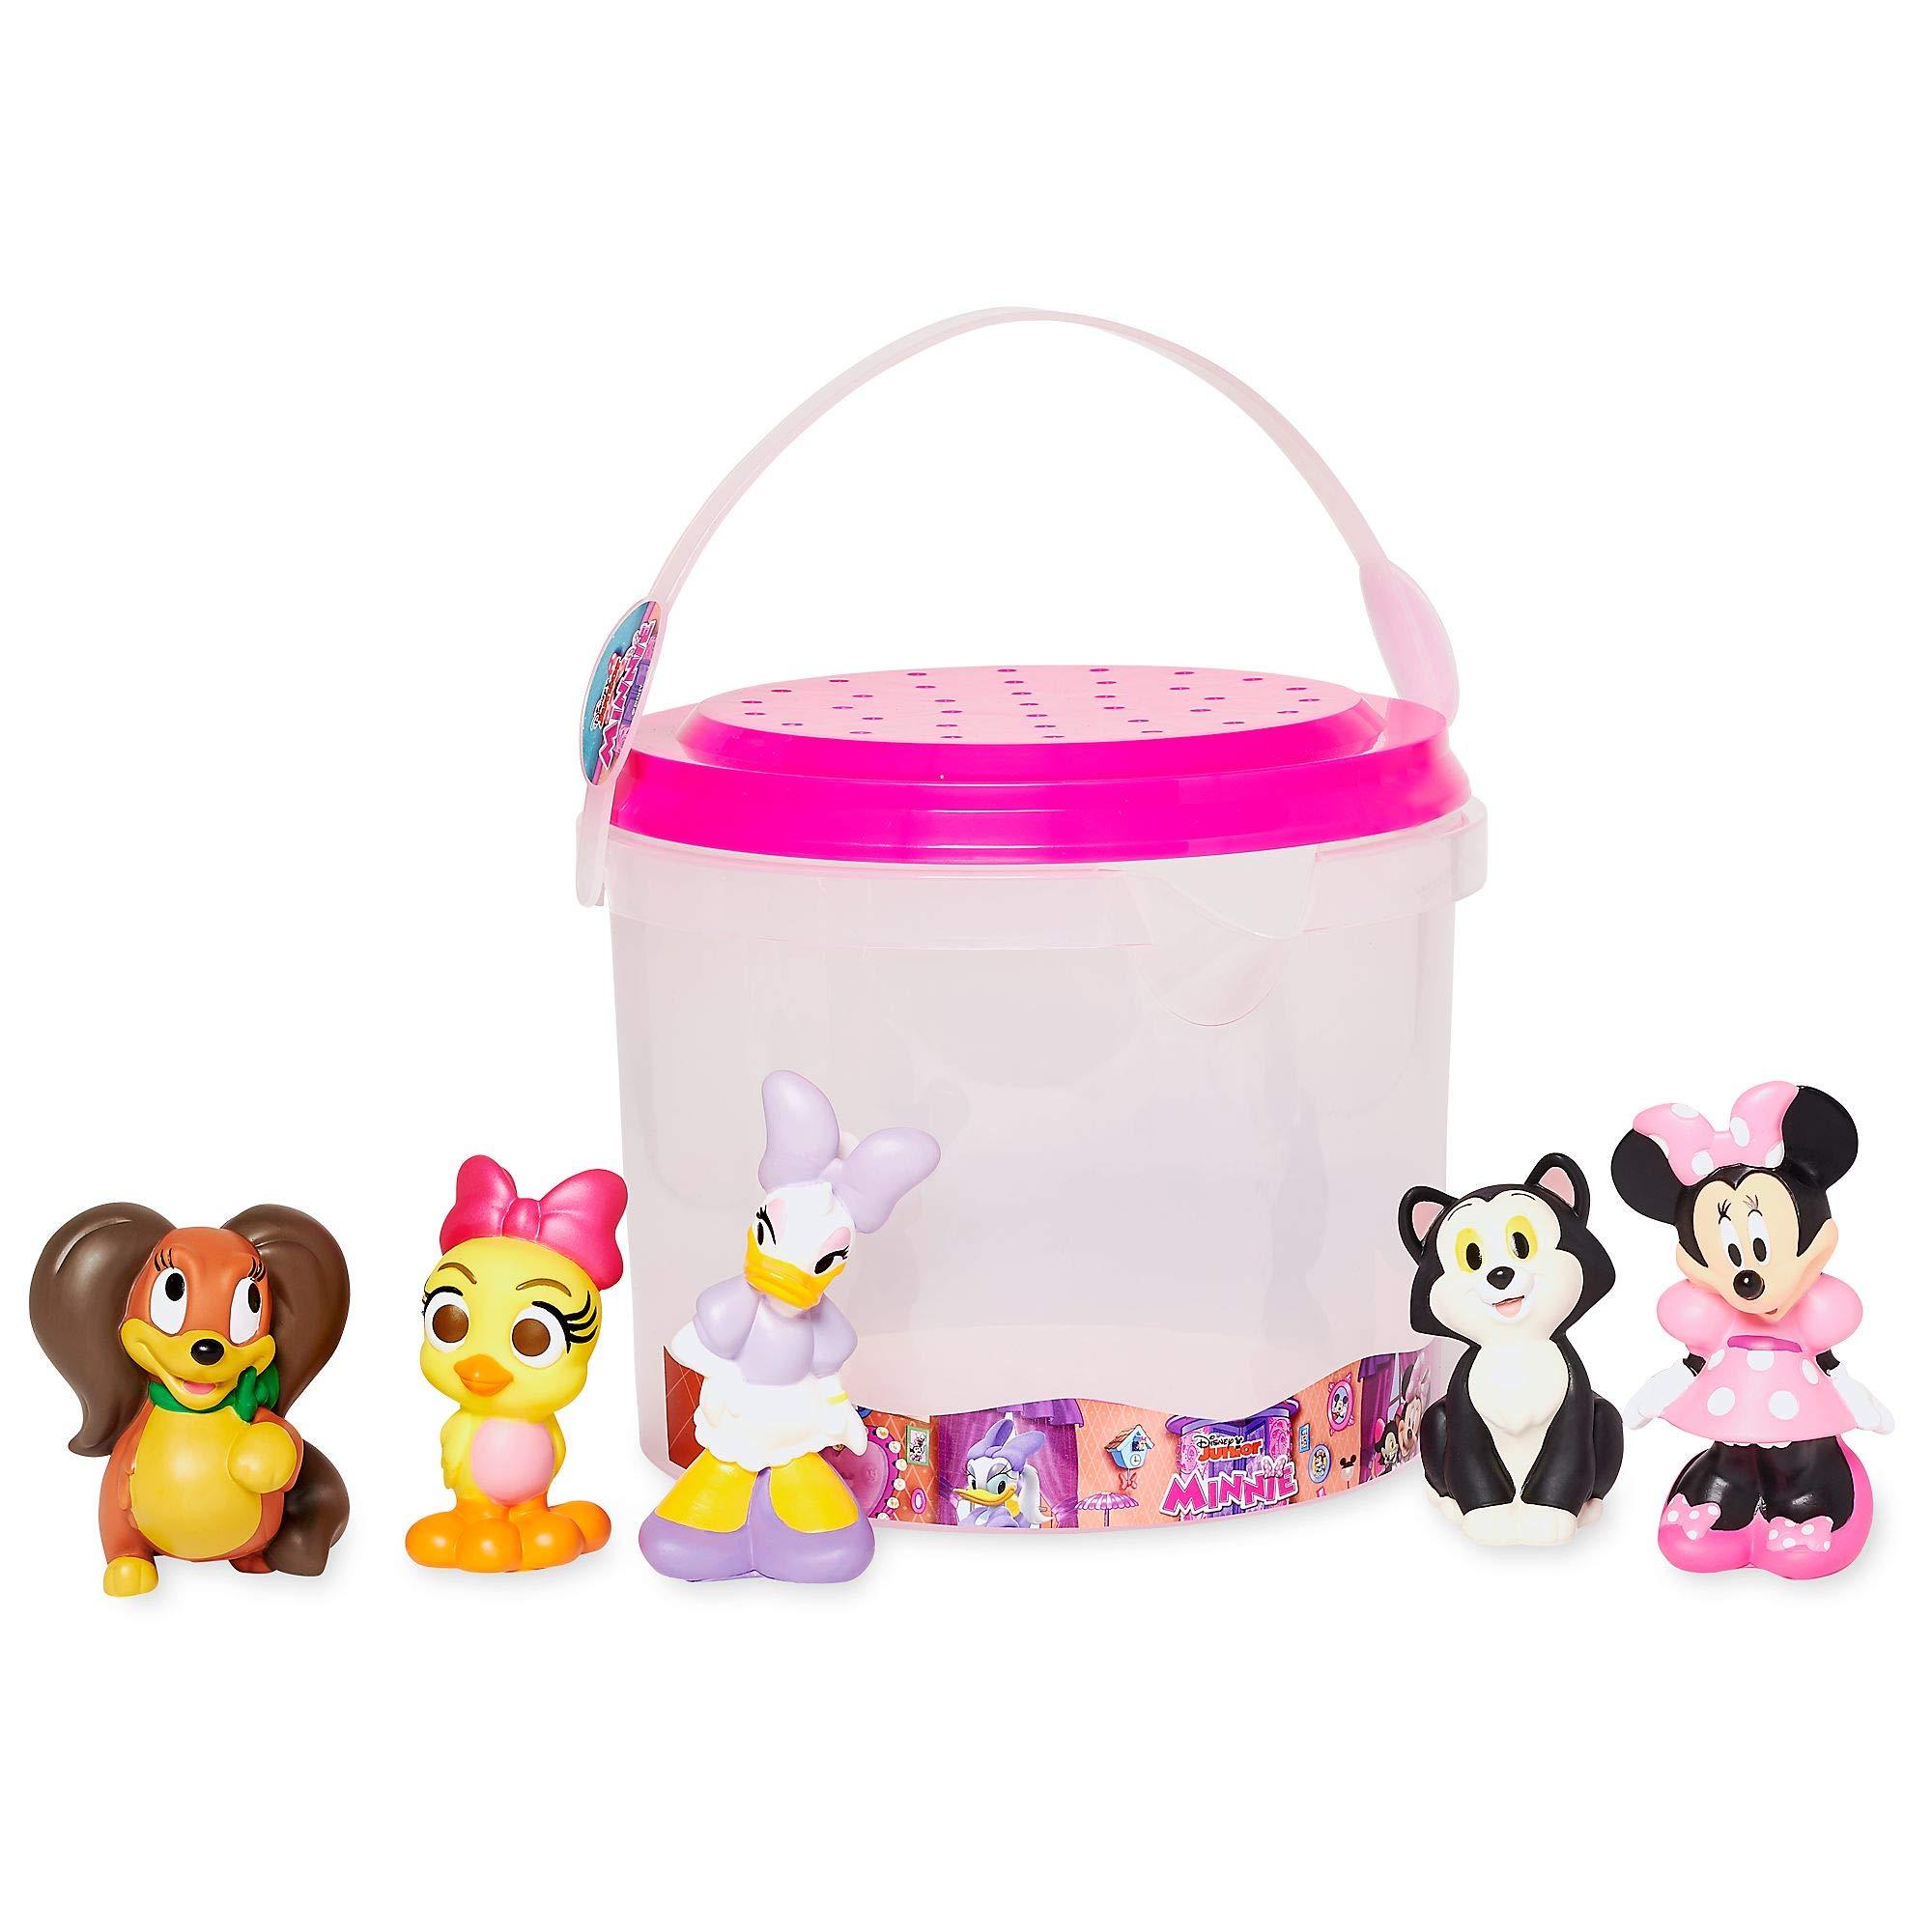 Disney Store Minnie Mouse Deluxe Bath Toys 5 Piece Set Tub Toy Playset